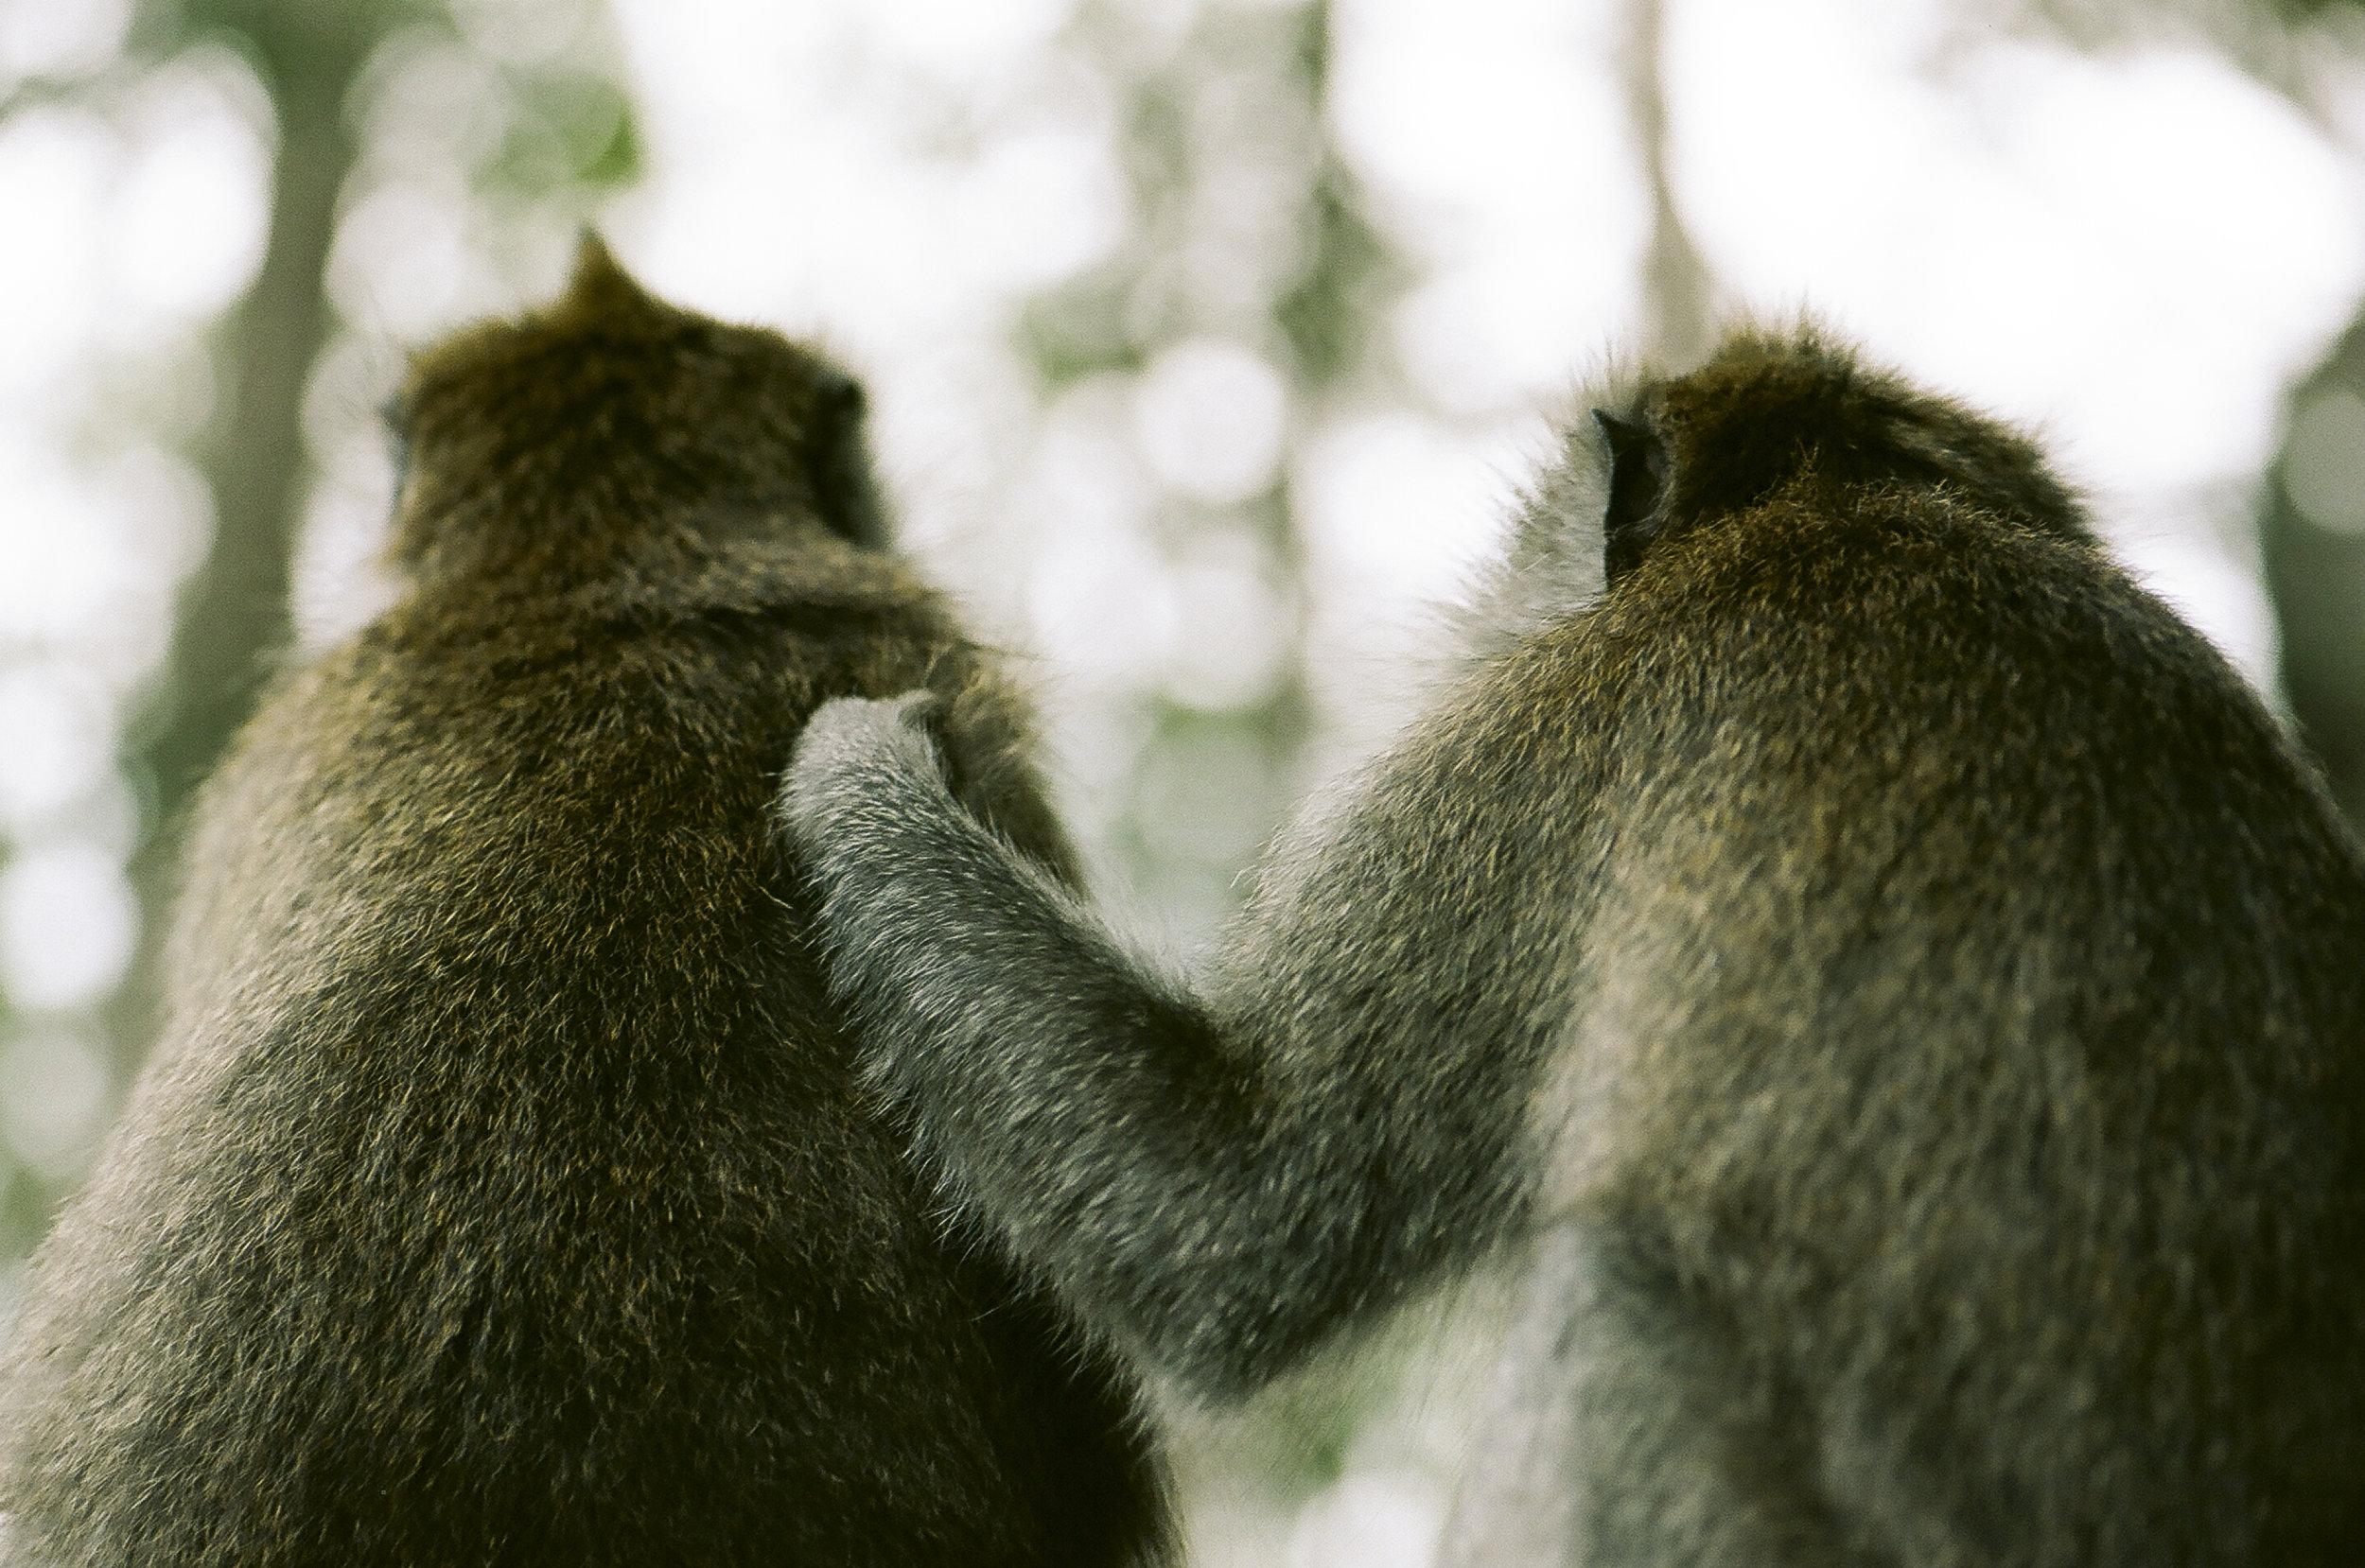 Monkeys_01 copy.jpg